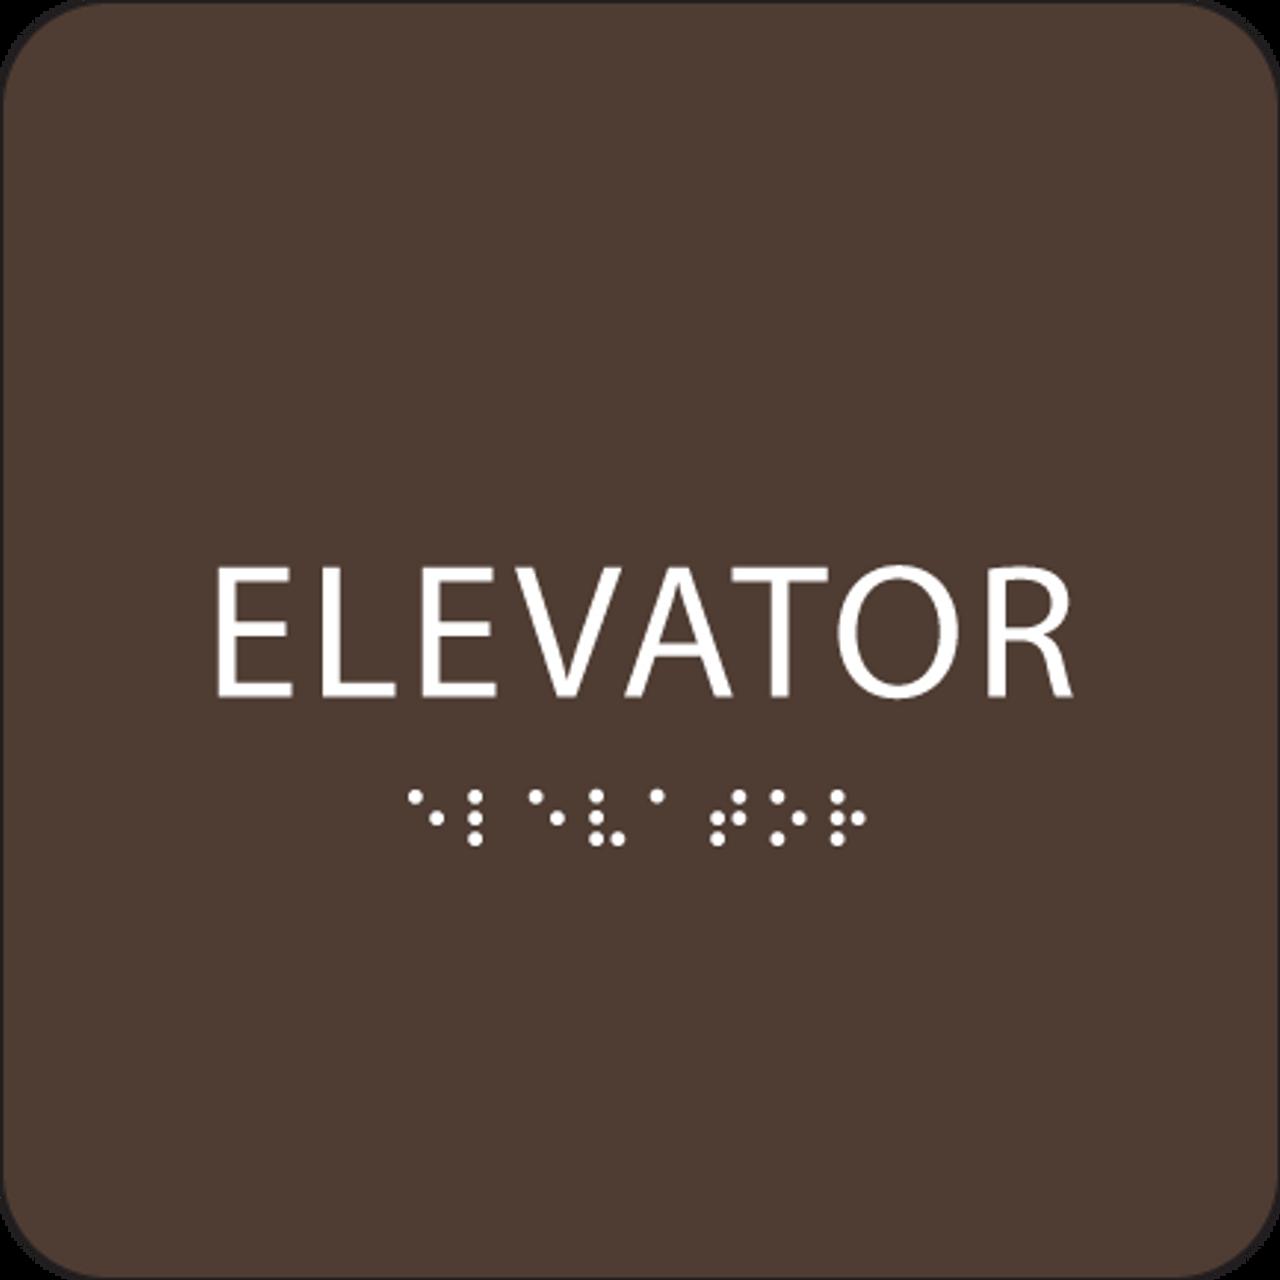 Dark Brown ADA Elevator Sign